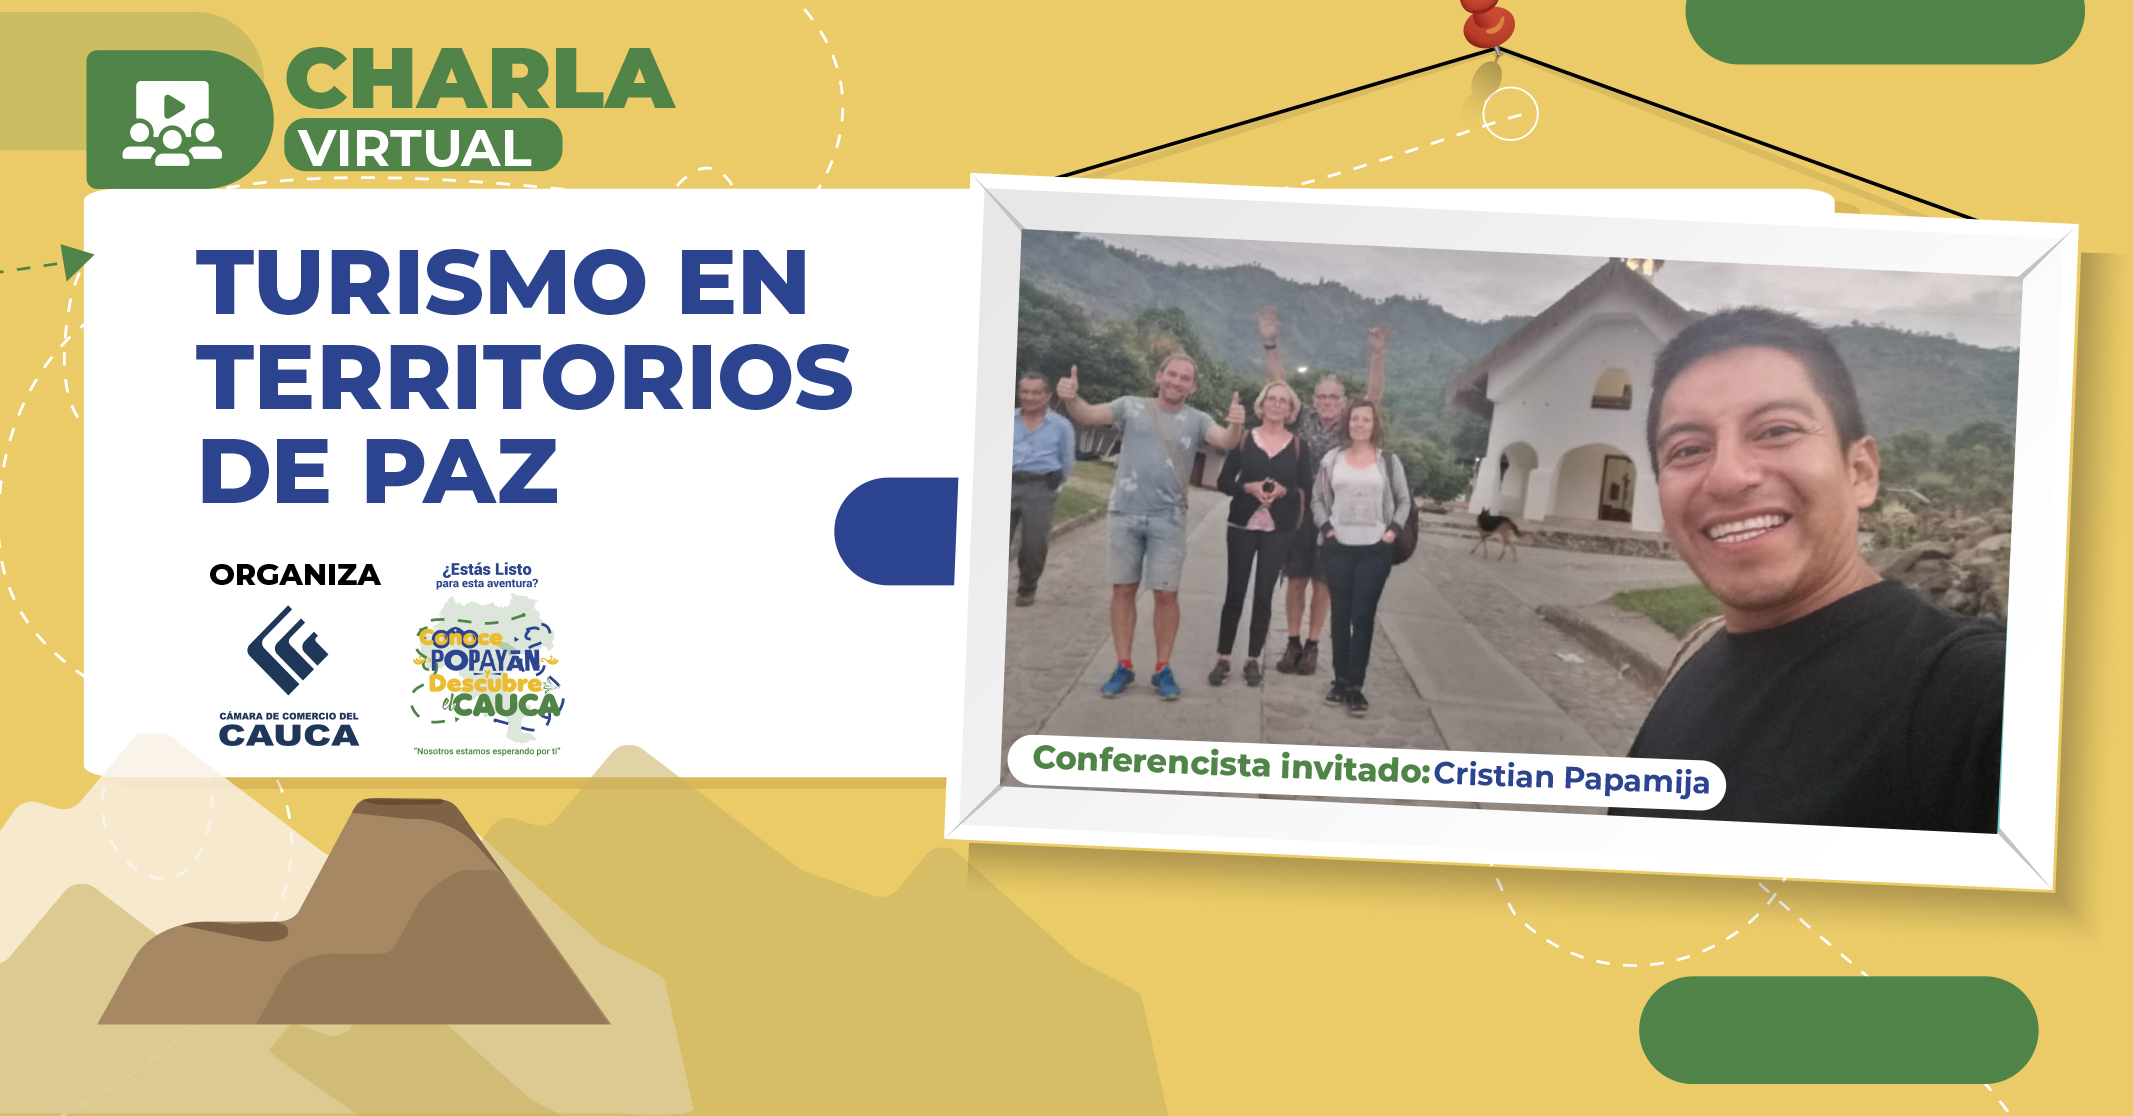 Charla virtual Cauca: Turismo en territorios de Paz